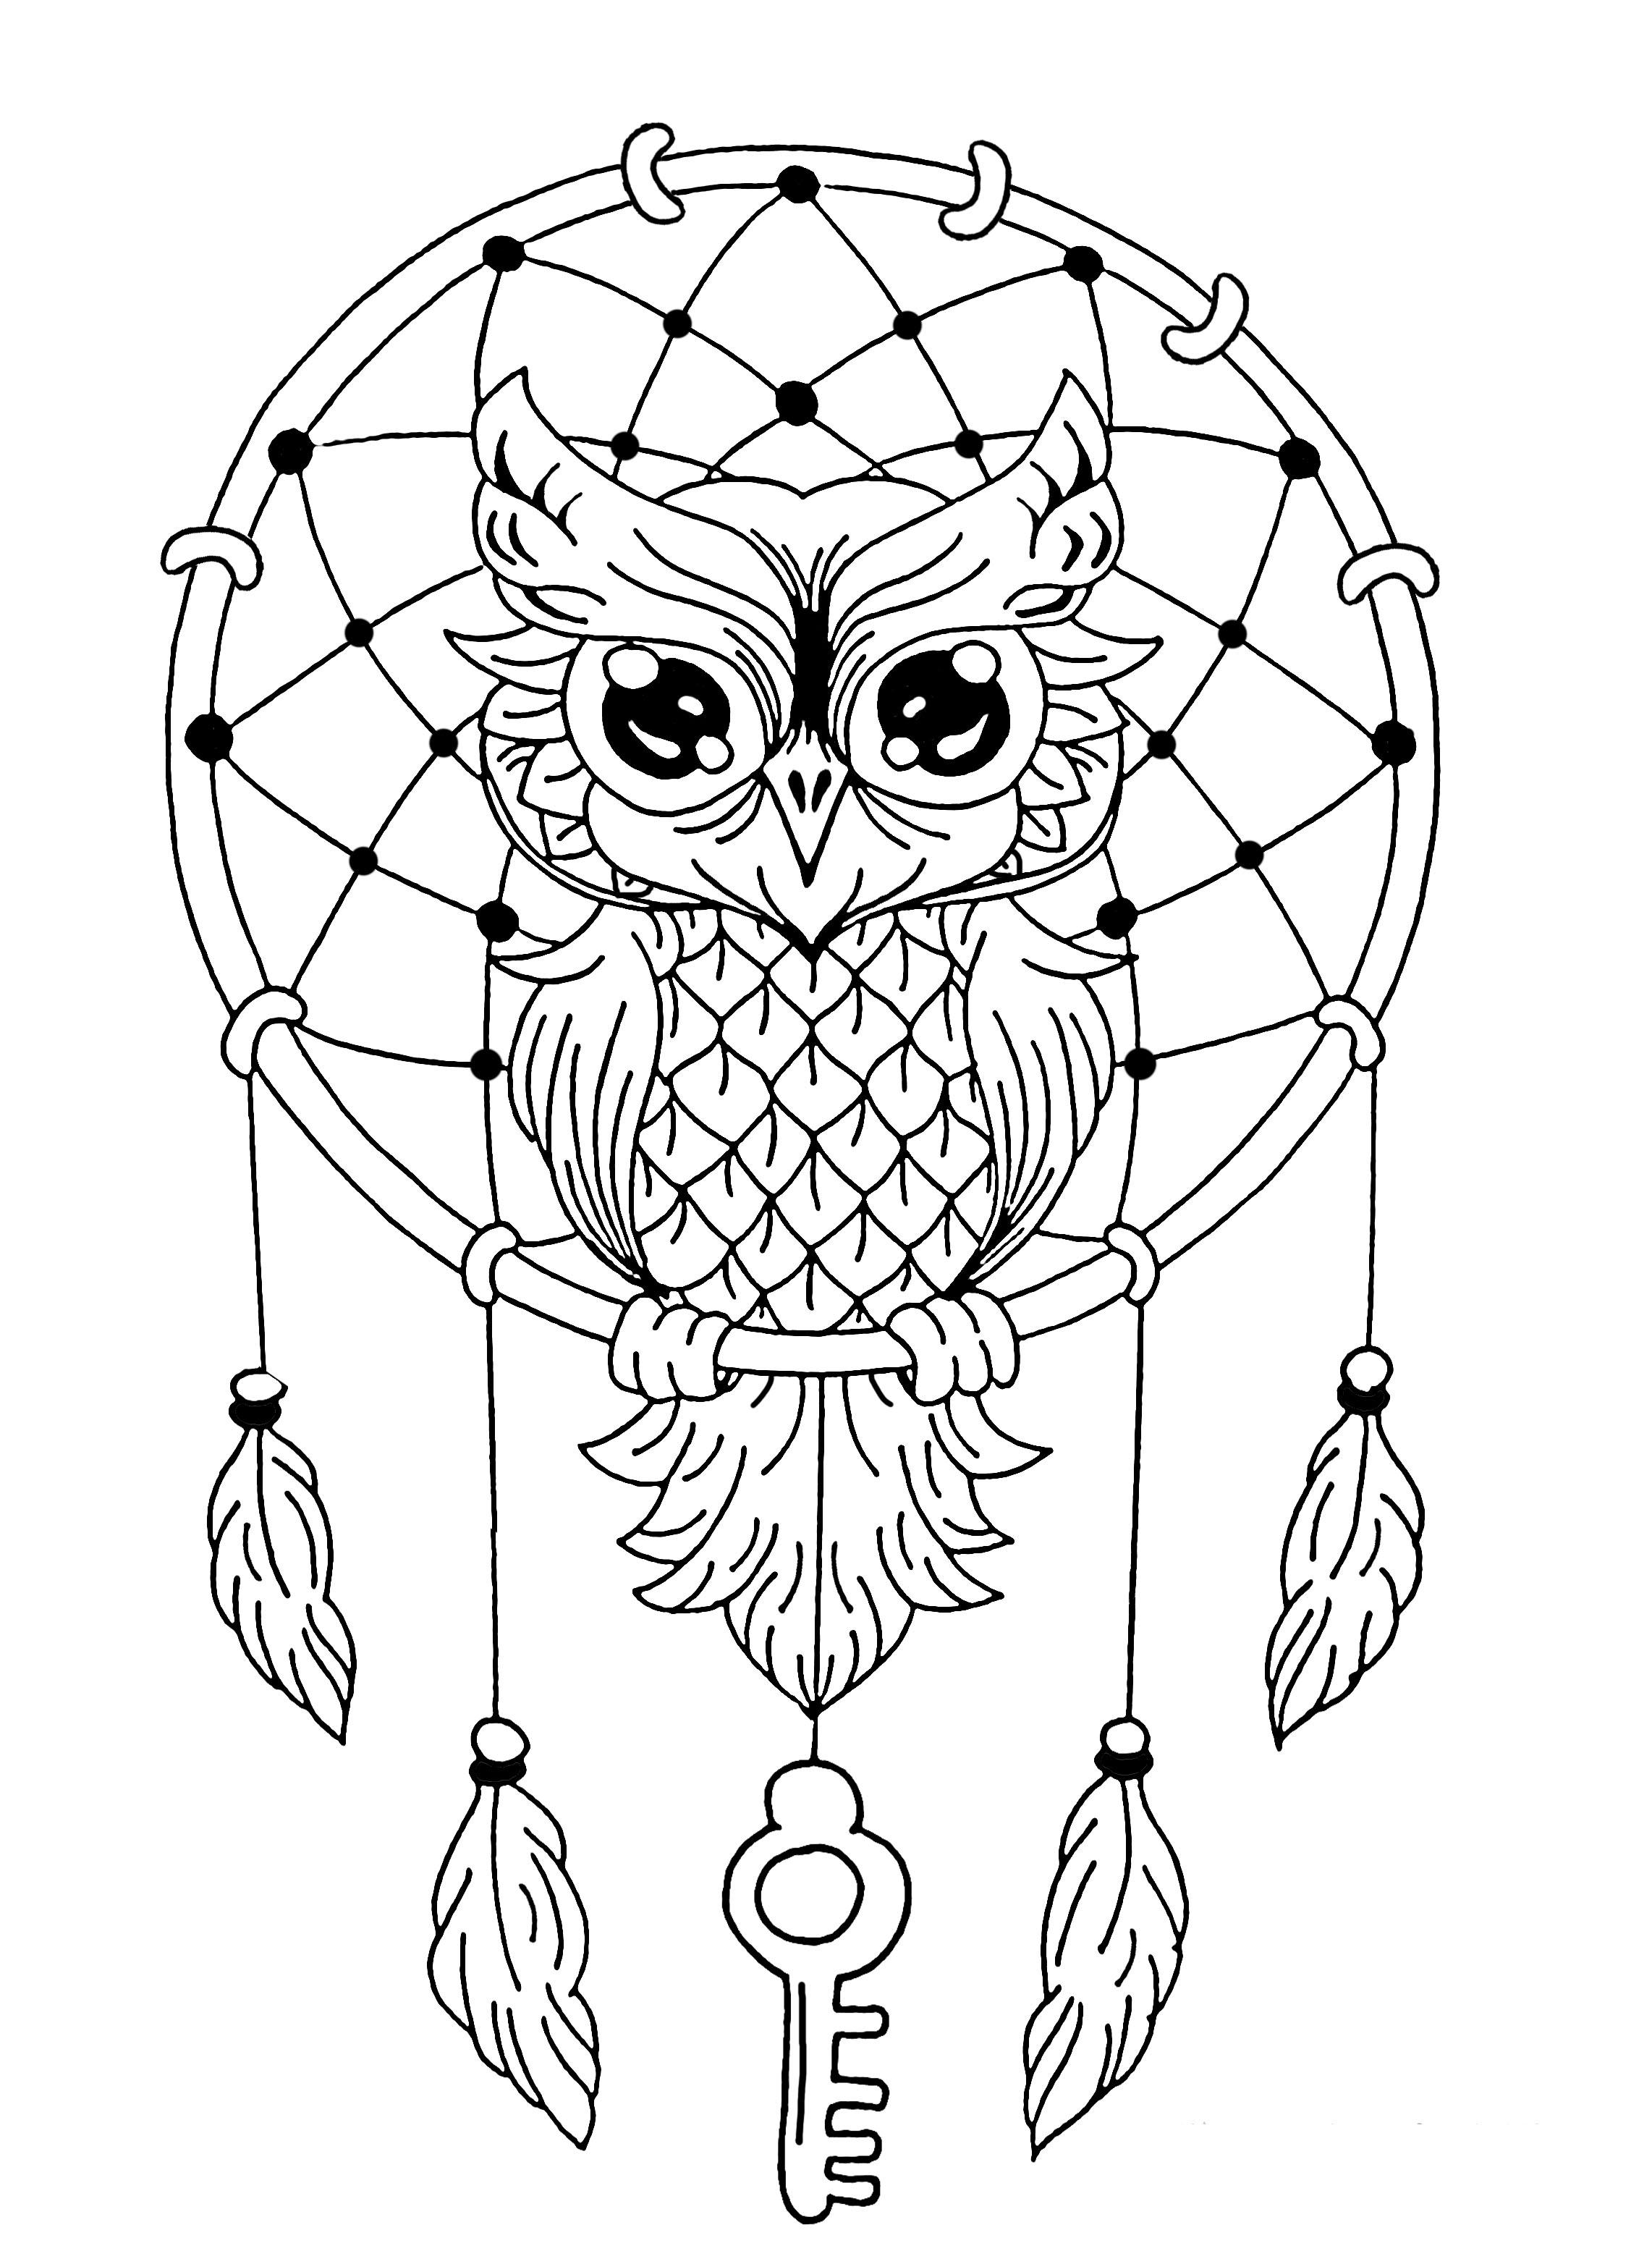 Impressionnant Dessin A Imprimer Mandala Cheval